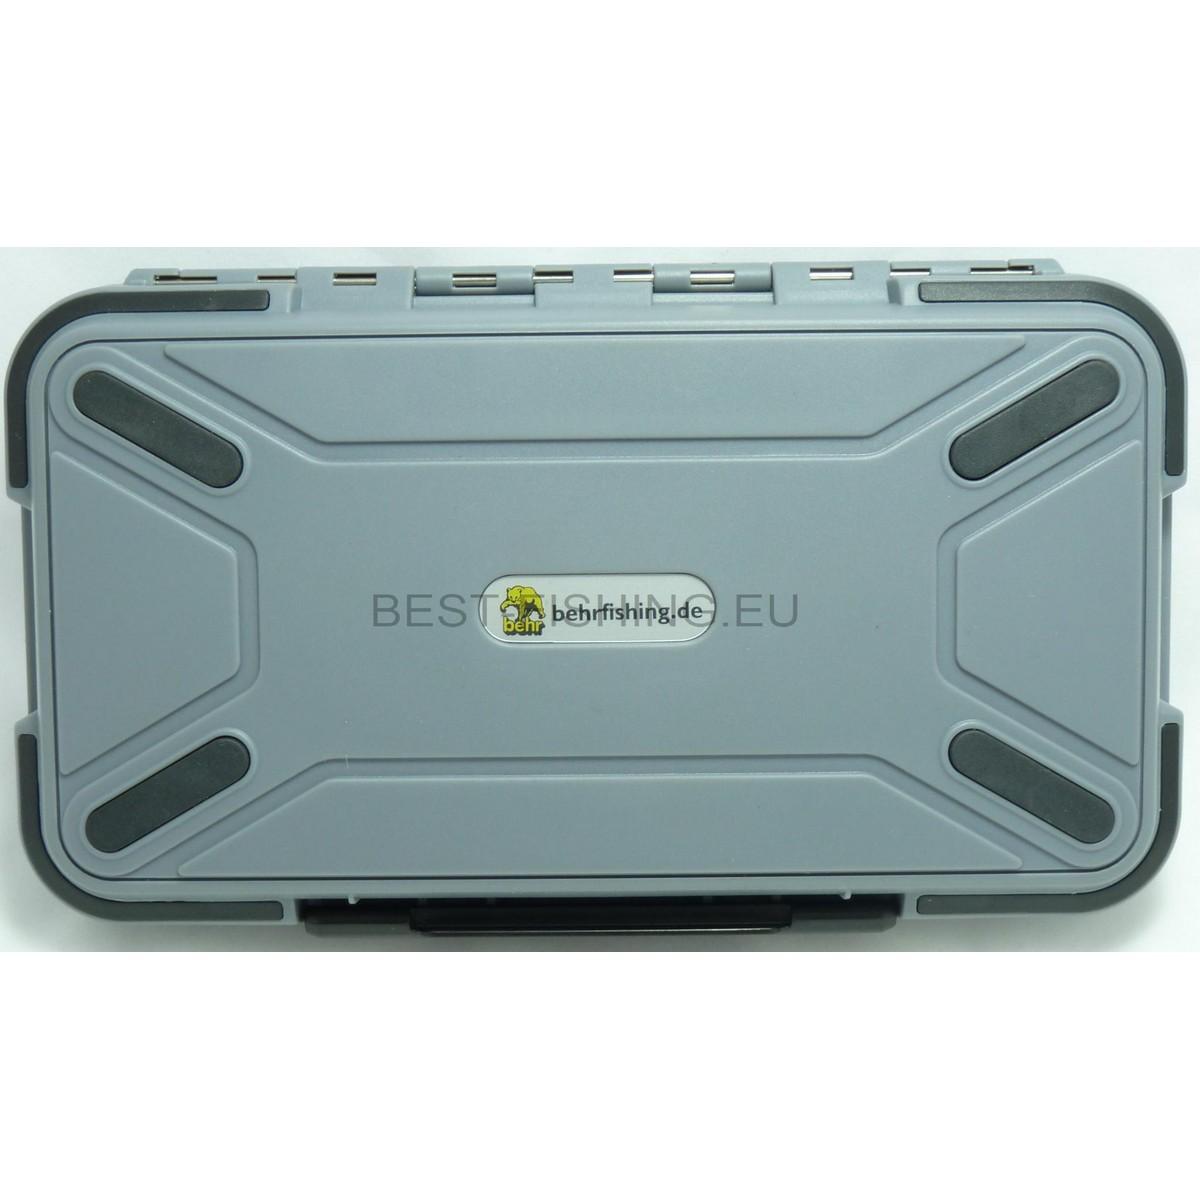 Кутия Behr мухарска 4620501